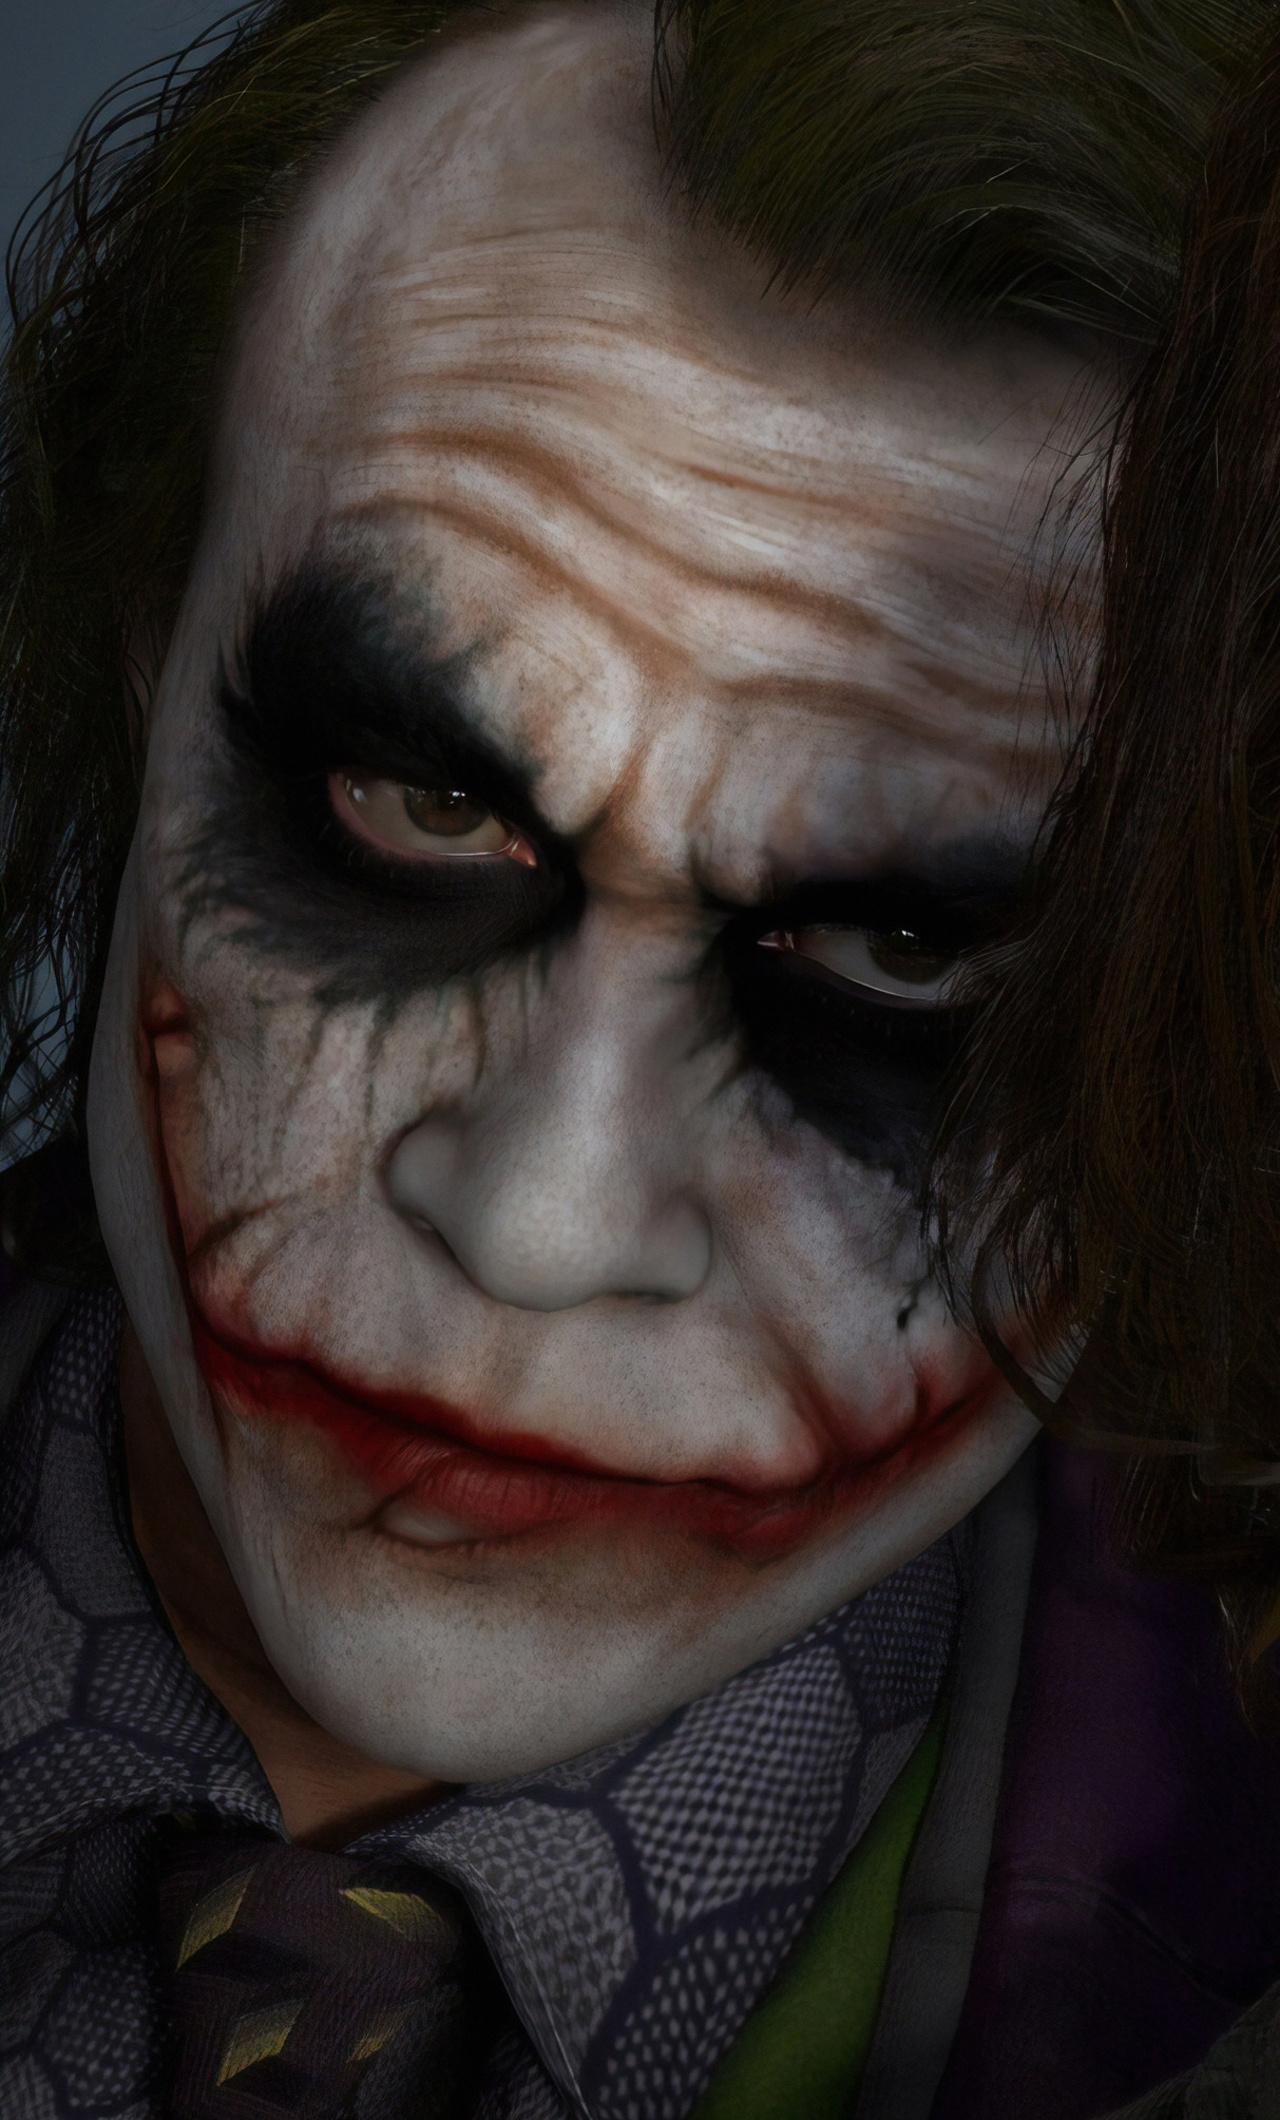 1280x2120 Joker Joaquin Phoenix Heath Ledger Iphone 6 Hd 4k